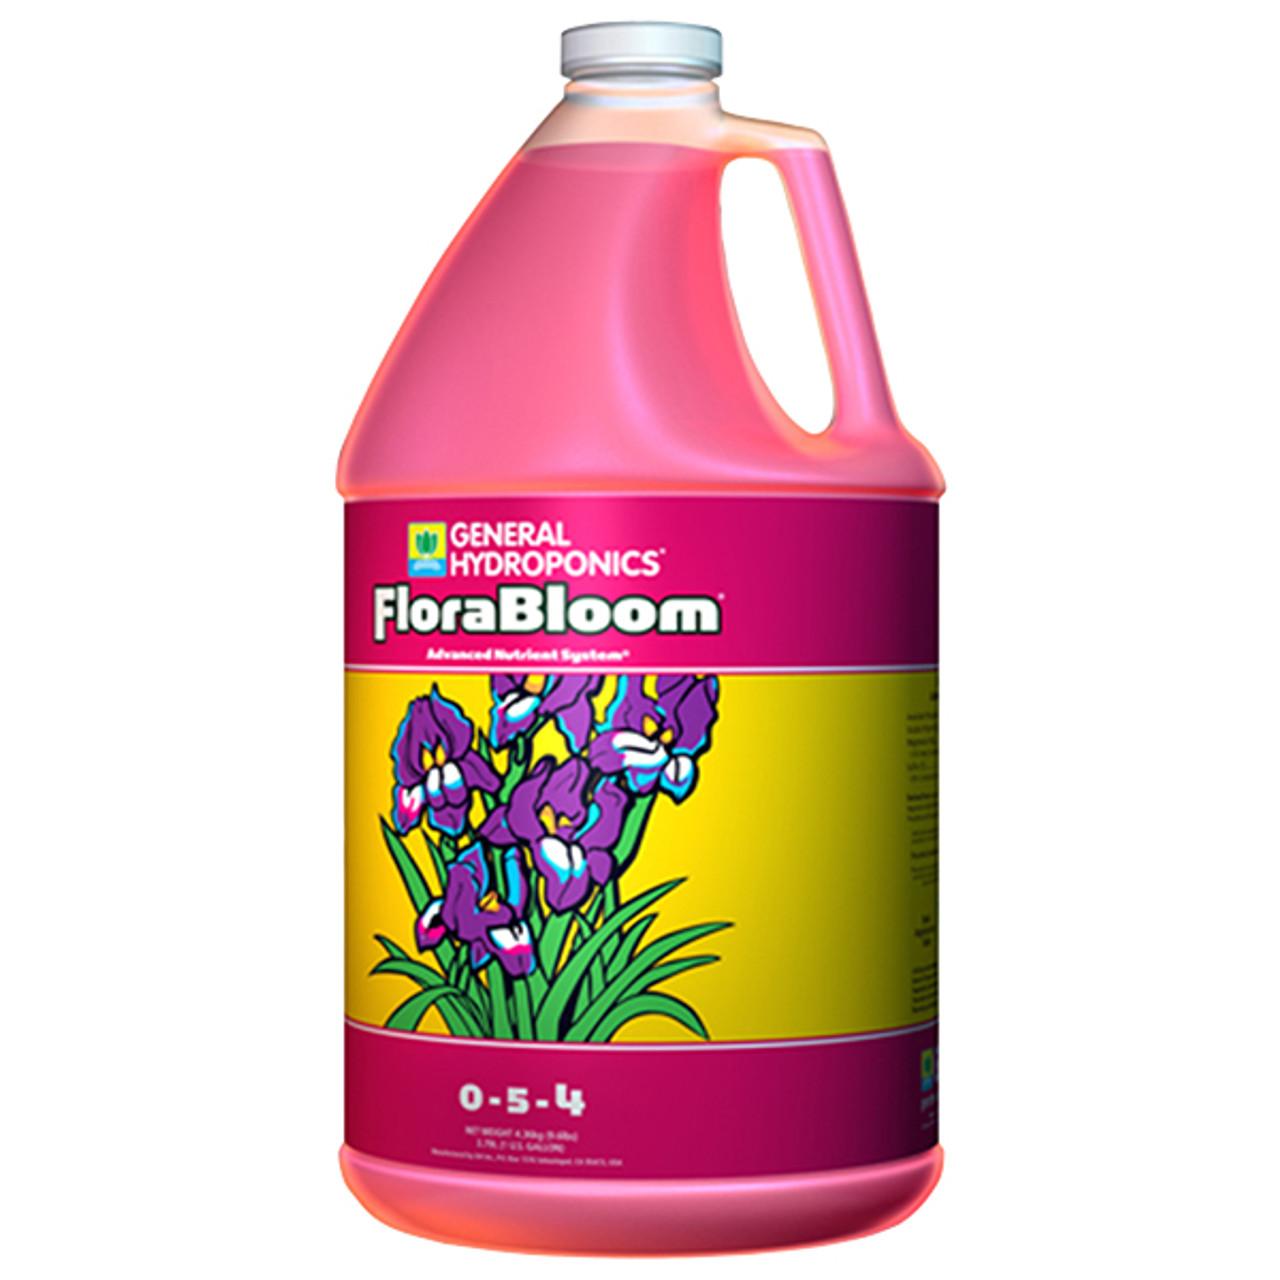 Stimulates flower and fruit development. Enhances flavor, aroma, and essential oils. Provides high phosphorous, potassium, magnesium and sulfur.